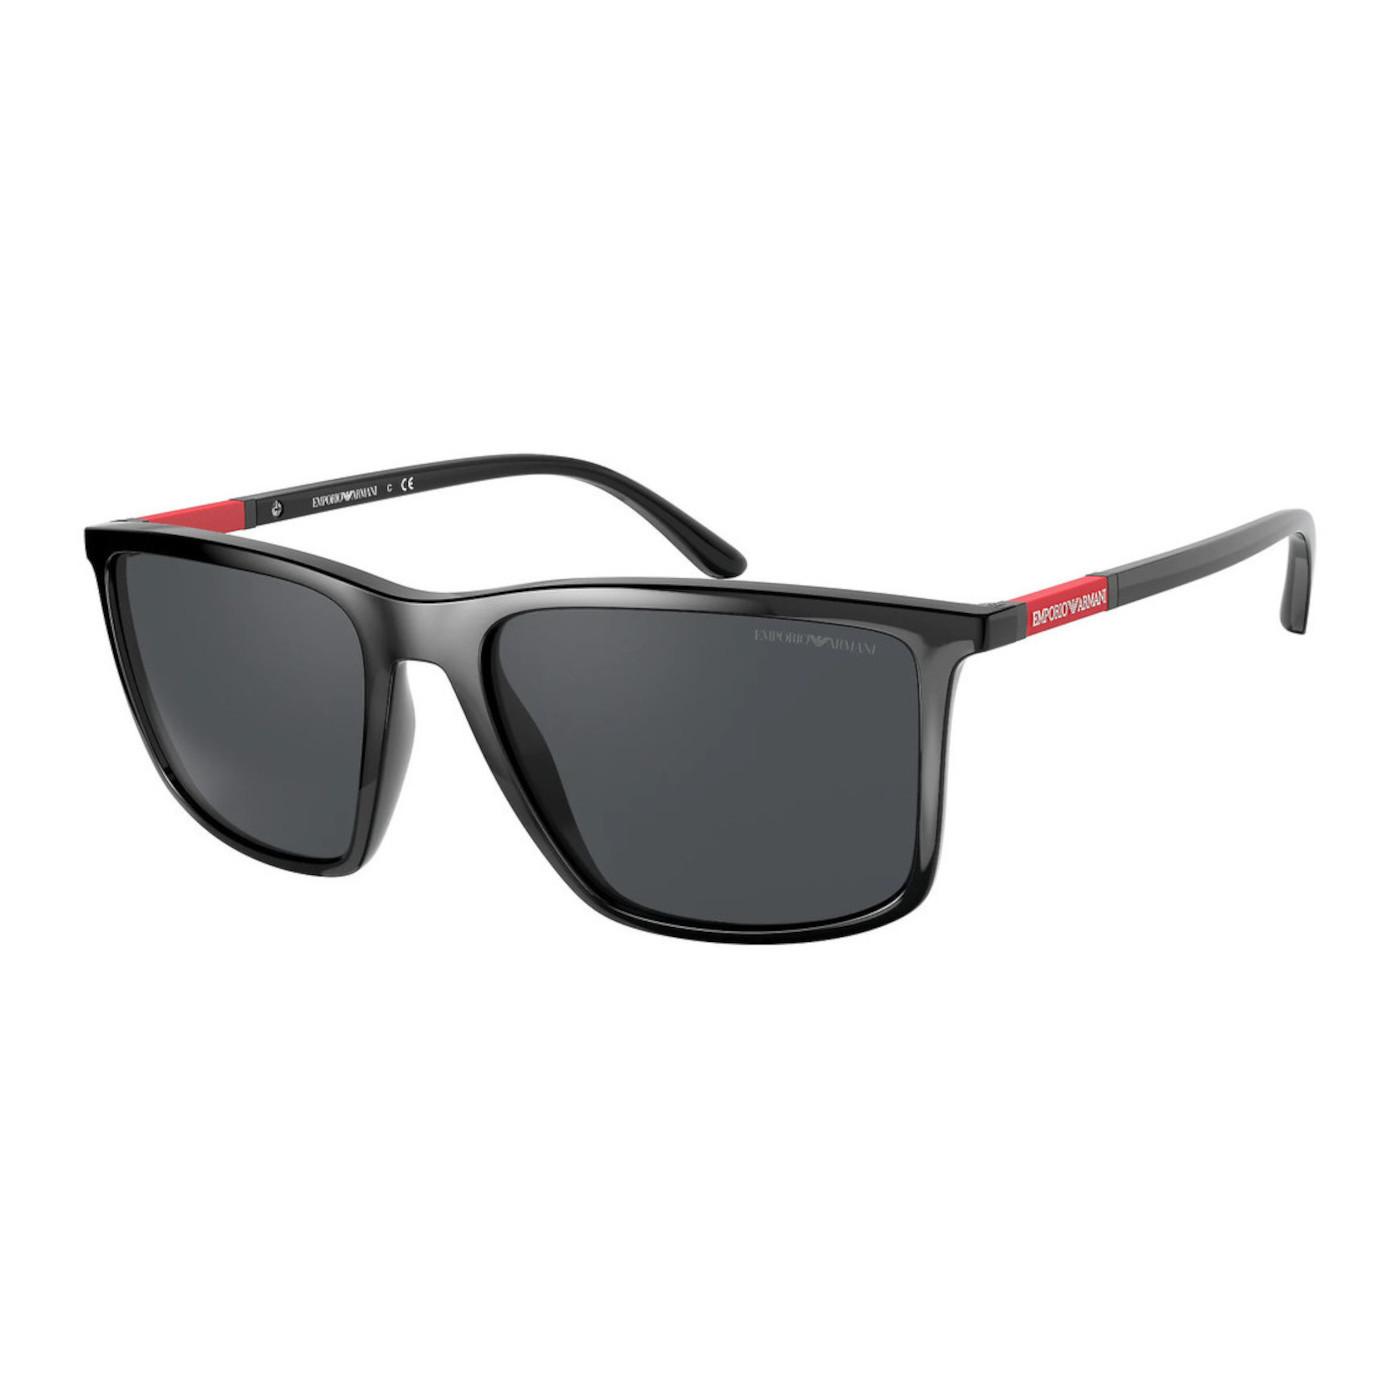 Emporio Armani Black Zonnebril EA416150178757